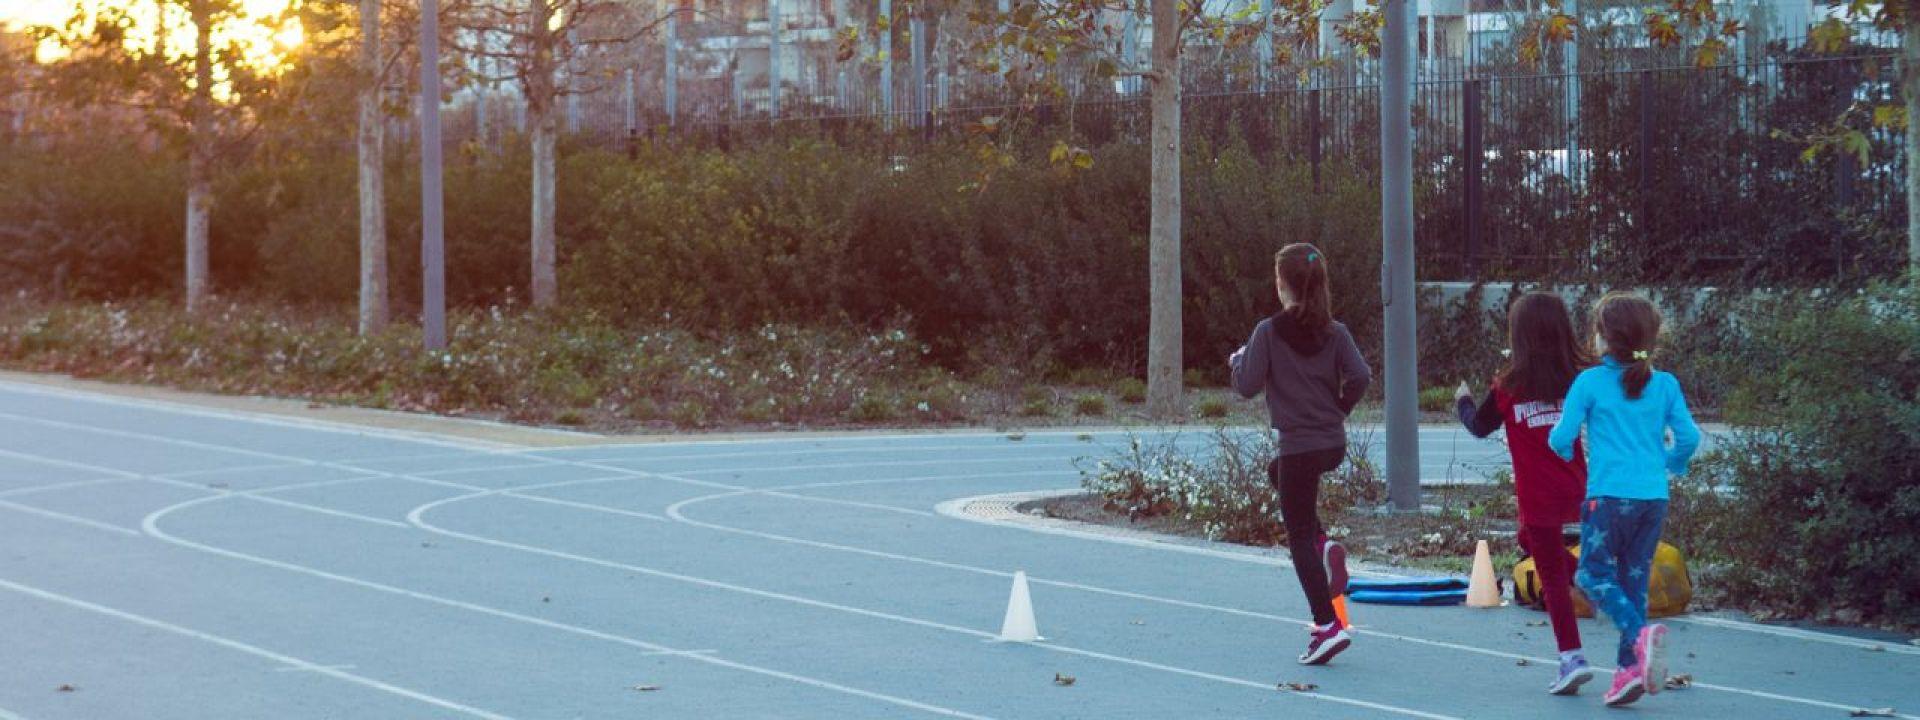 Sporting Duels - Εικόνα